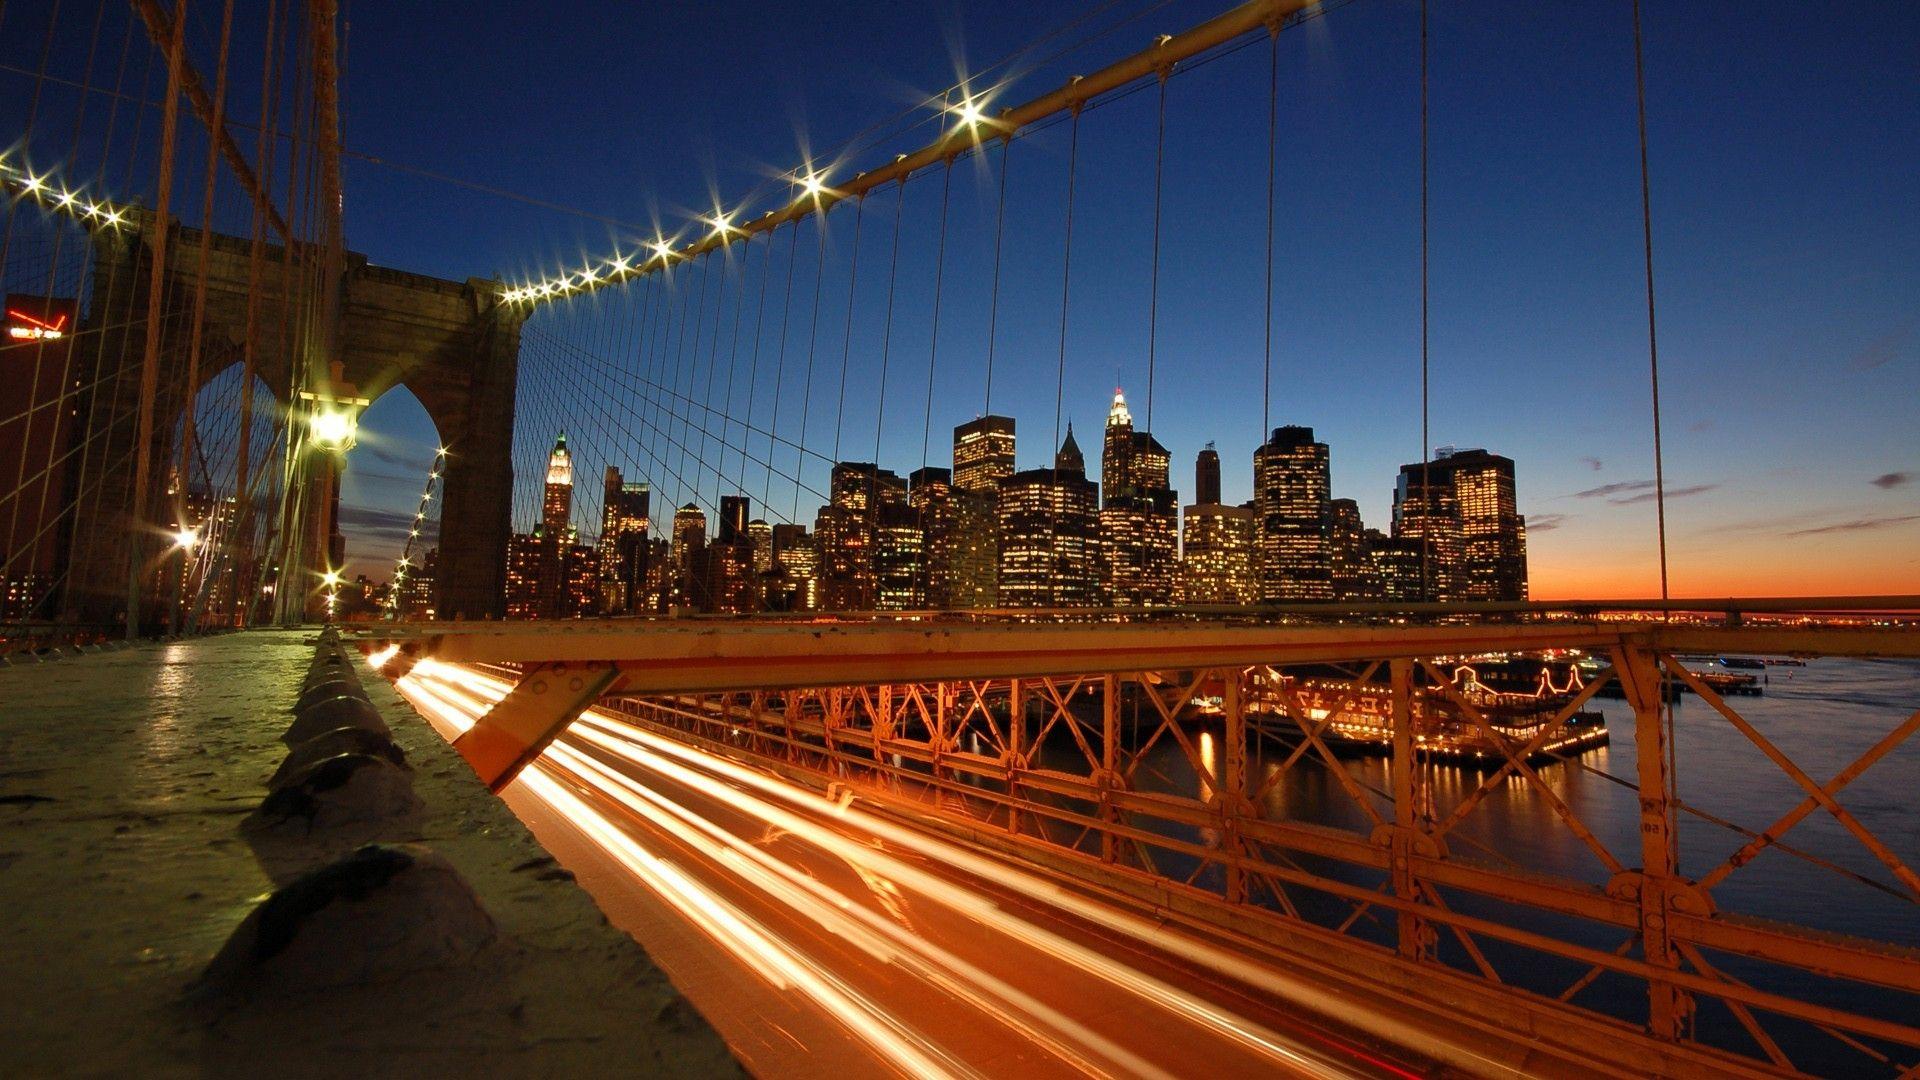 Good Wallpaper Night Brooklyn Bridge - eb544933063dc2e436ac452fb3621827  Pictures.jpg